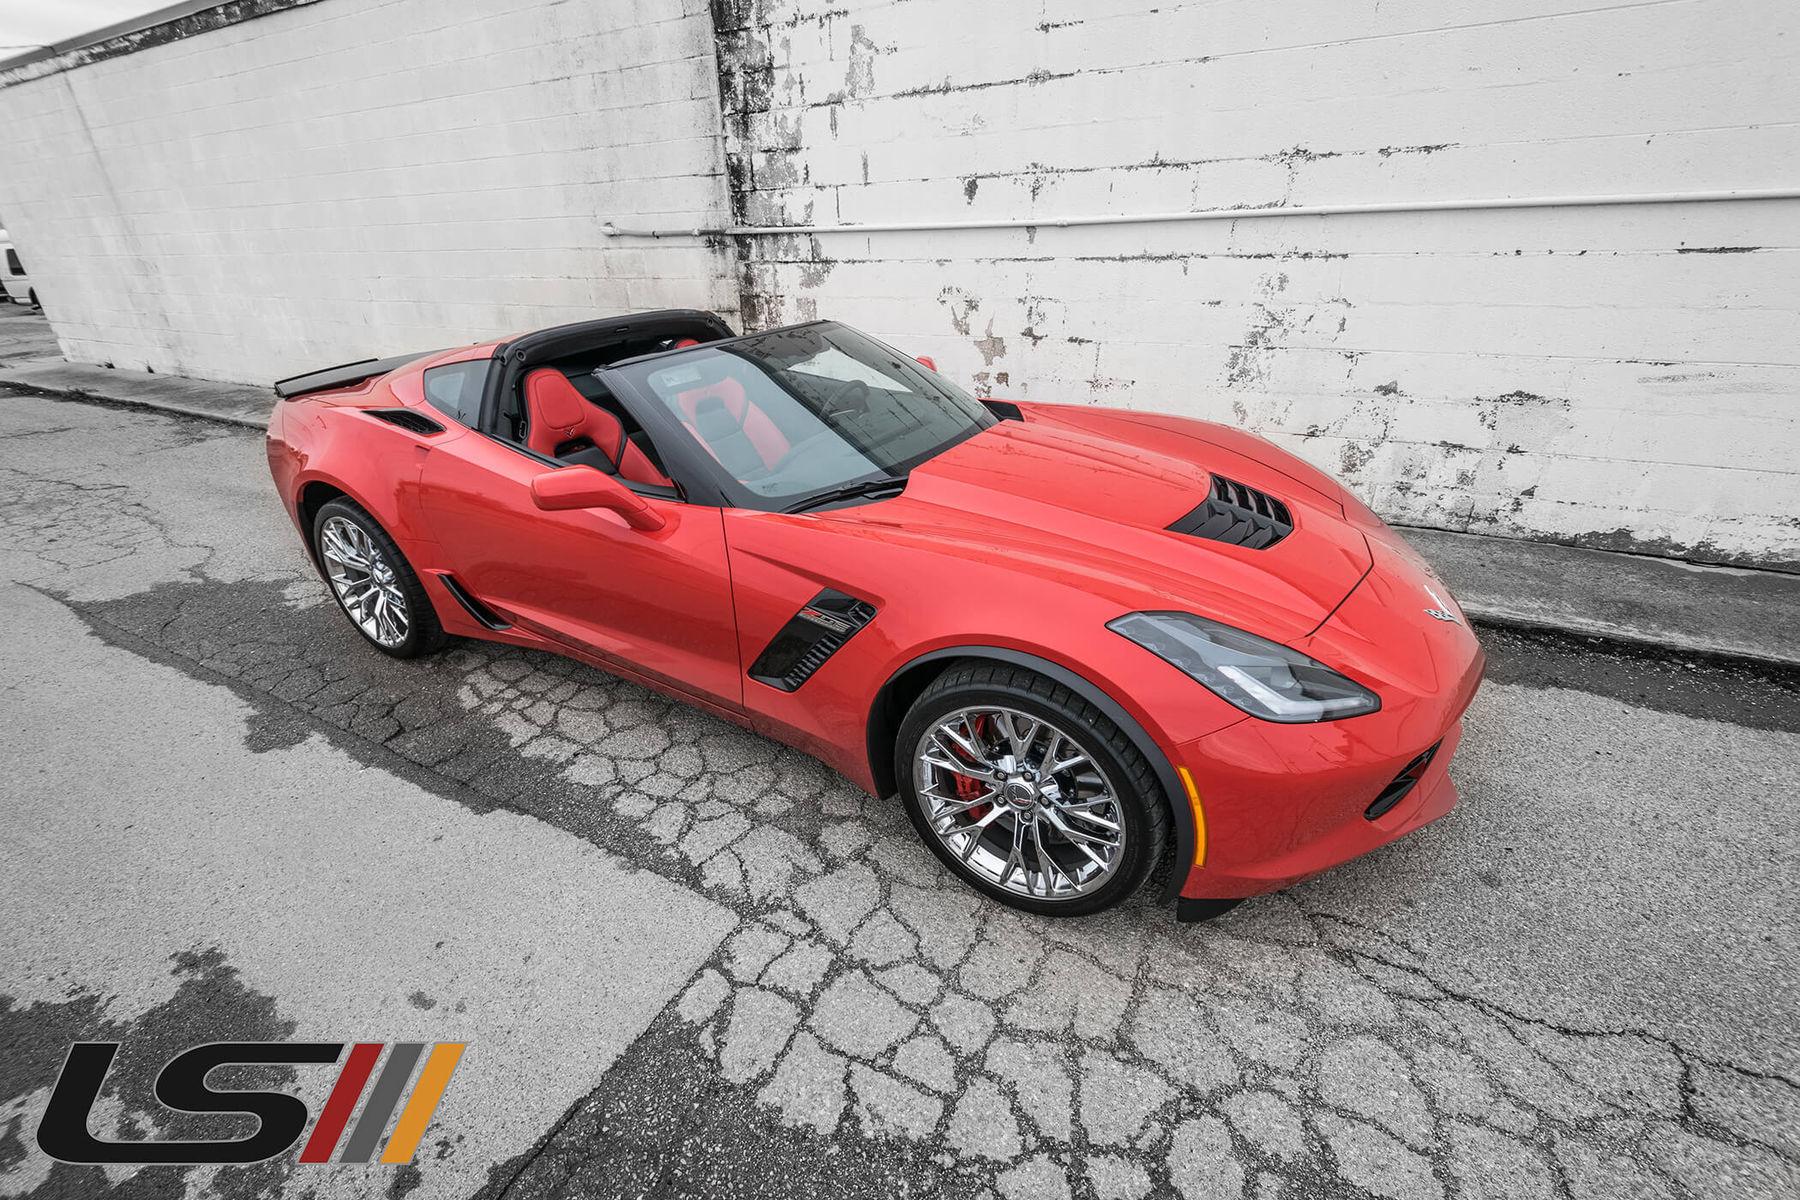 2015 C7 Corvette Z06 Leather Interior By LeatherSeats com